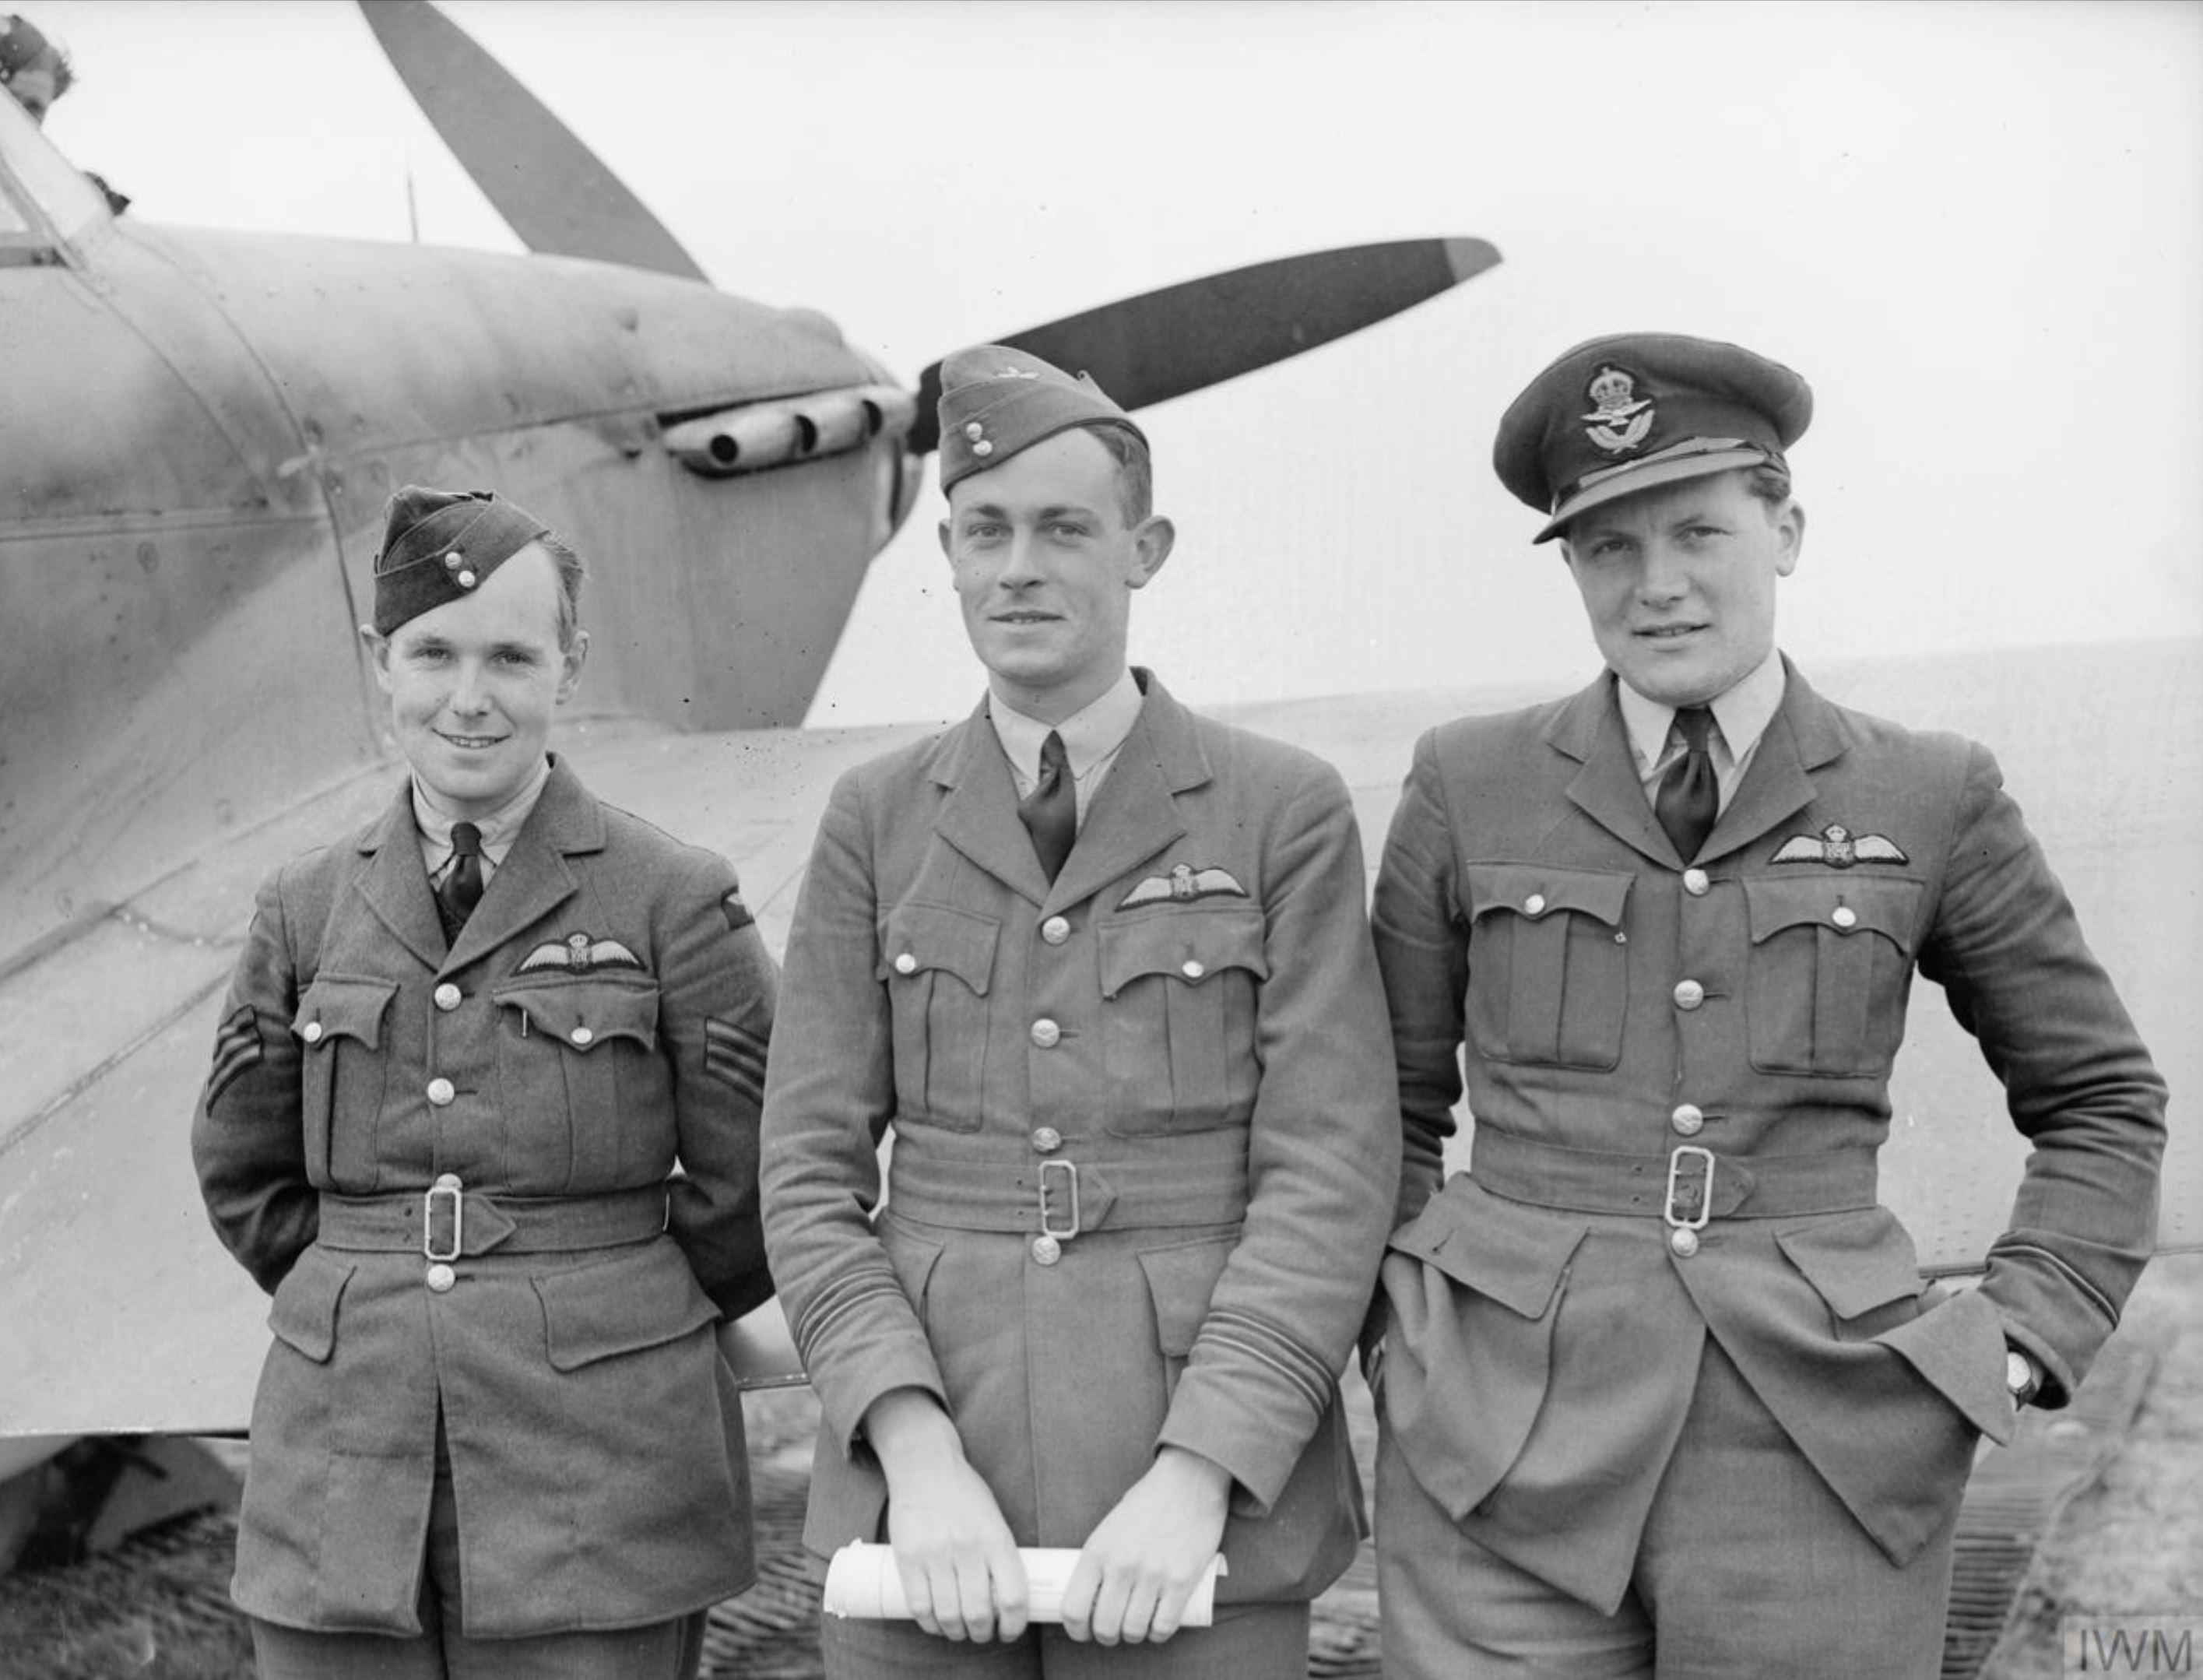 Aircrew RAF 73Sqn Lionel Pilkington, Reginald Lovett, Newall Orton April 1940 IWM C1329